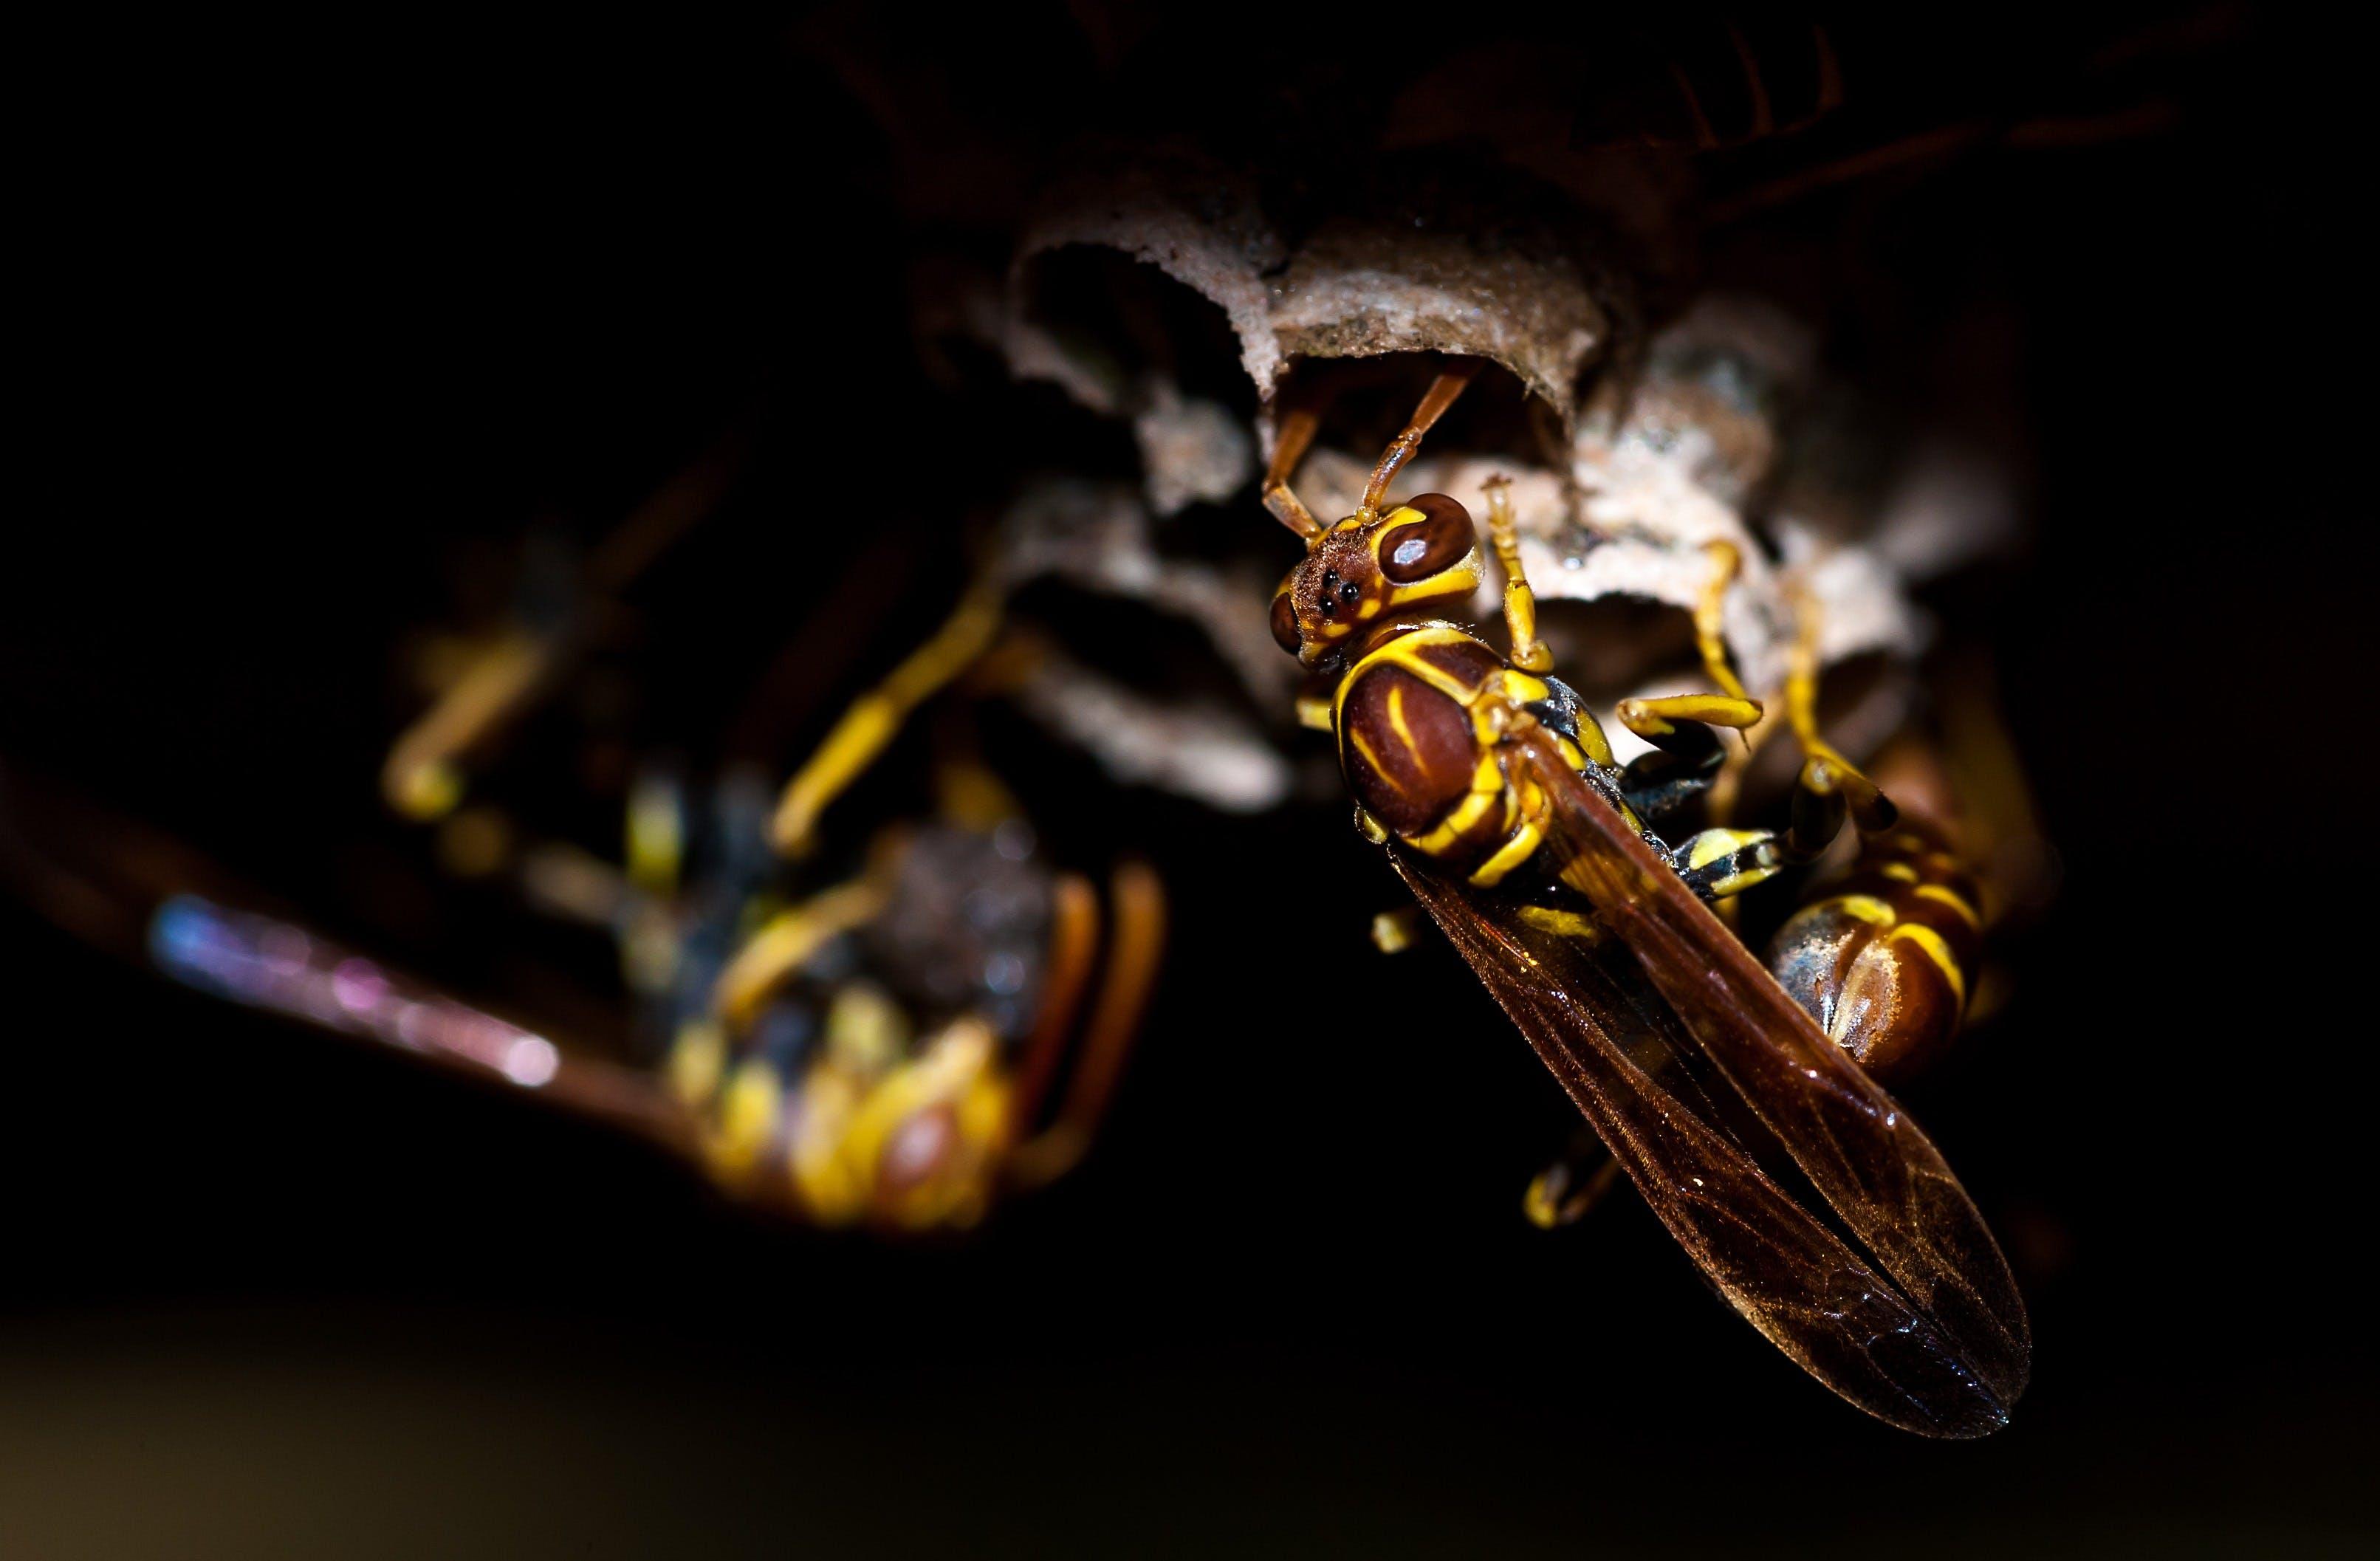 Swarm of Yellowjacket Wasps